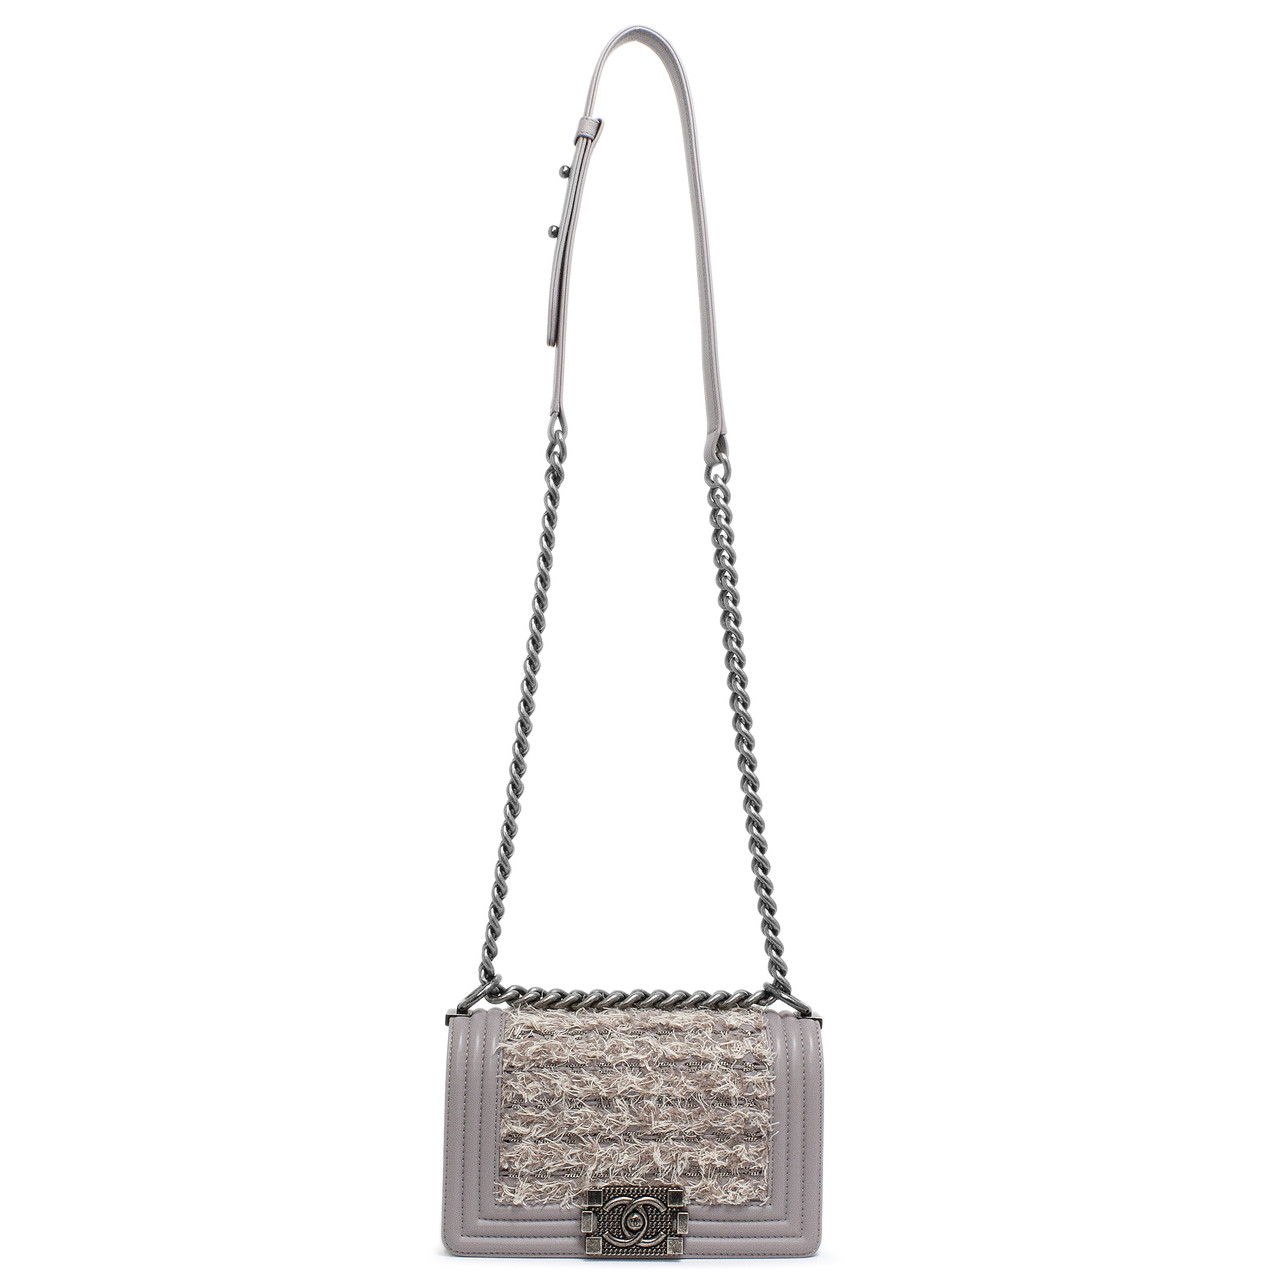 5190903ac093 Chanel Mauve Lambskin & Tweed Small Boy Bag - modaselle